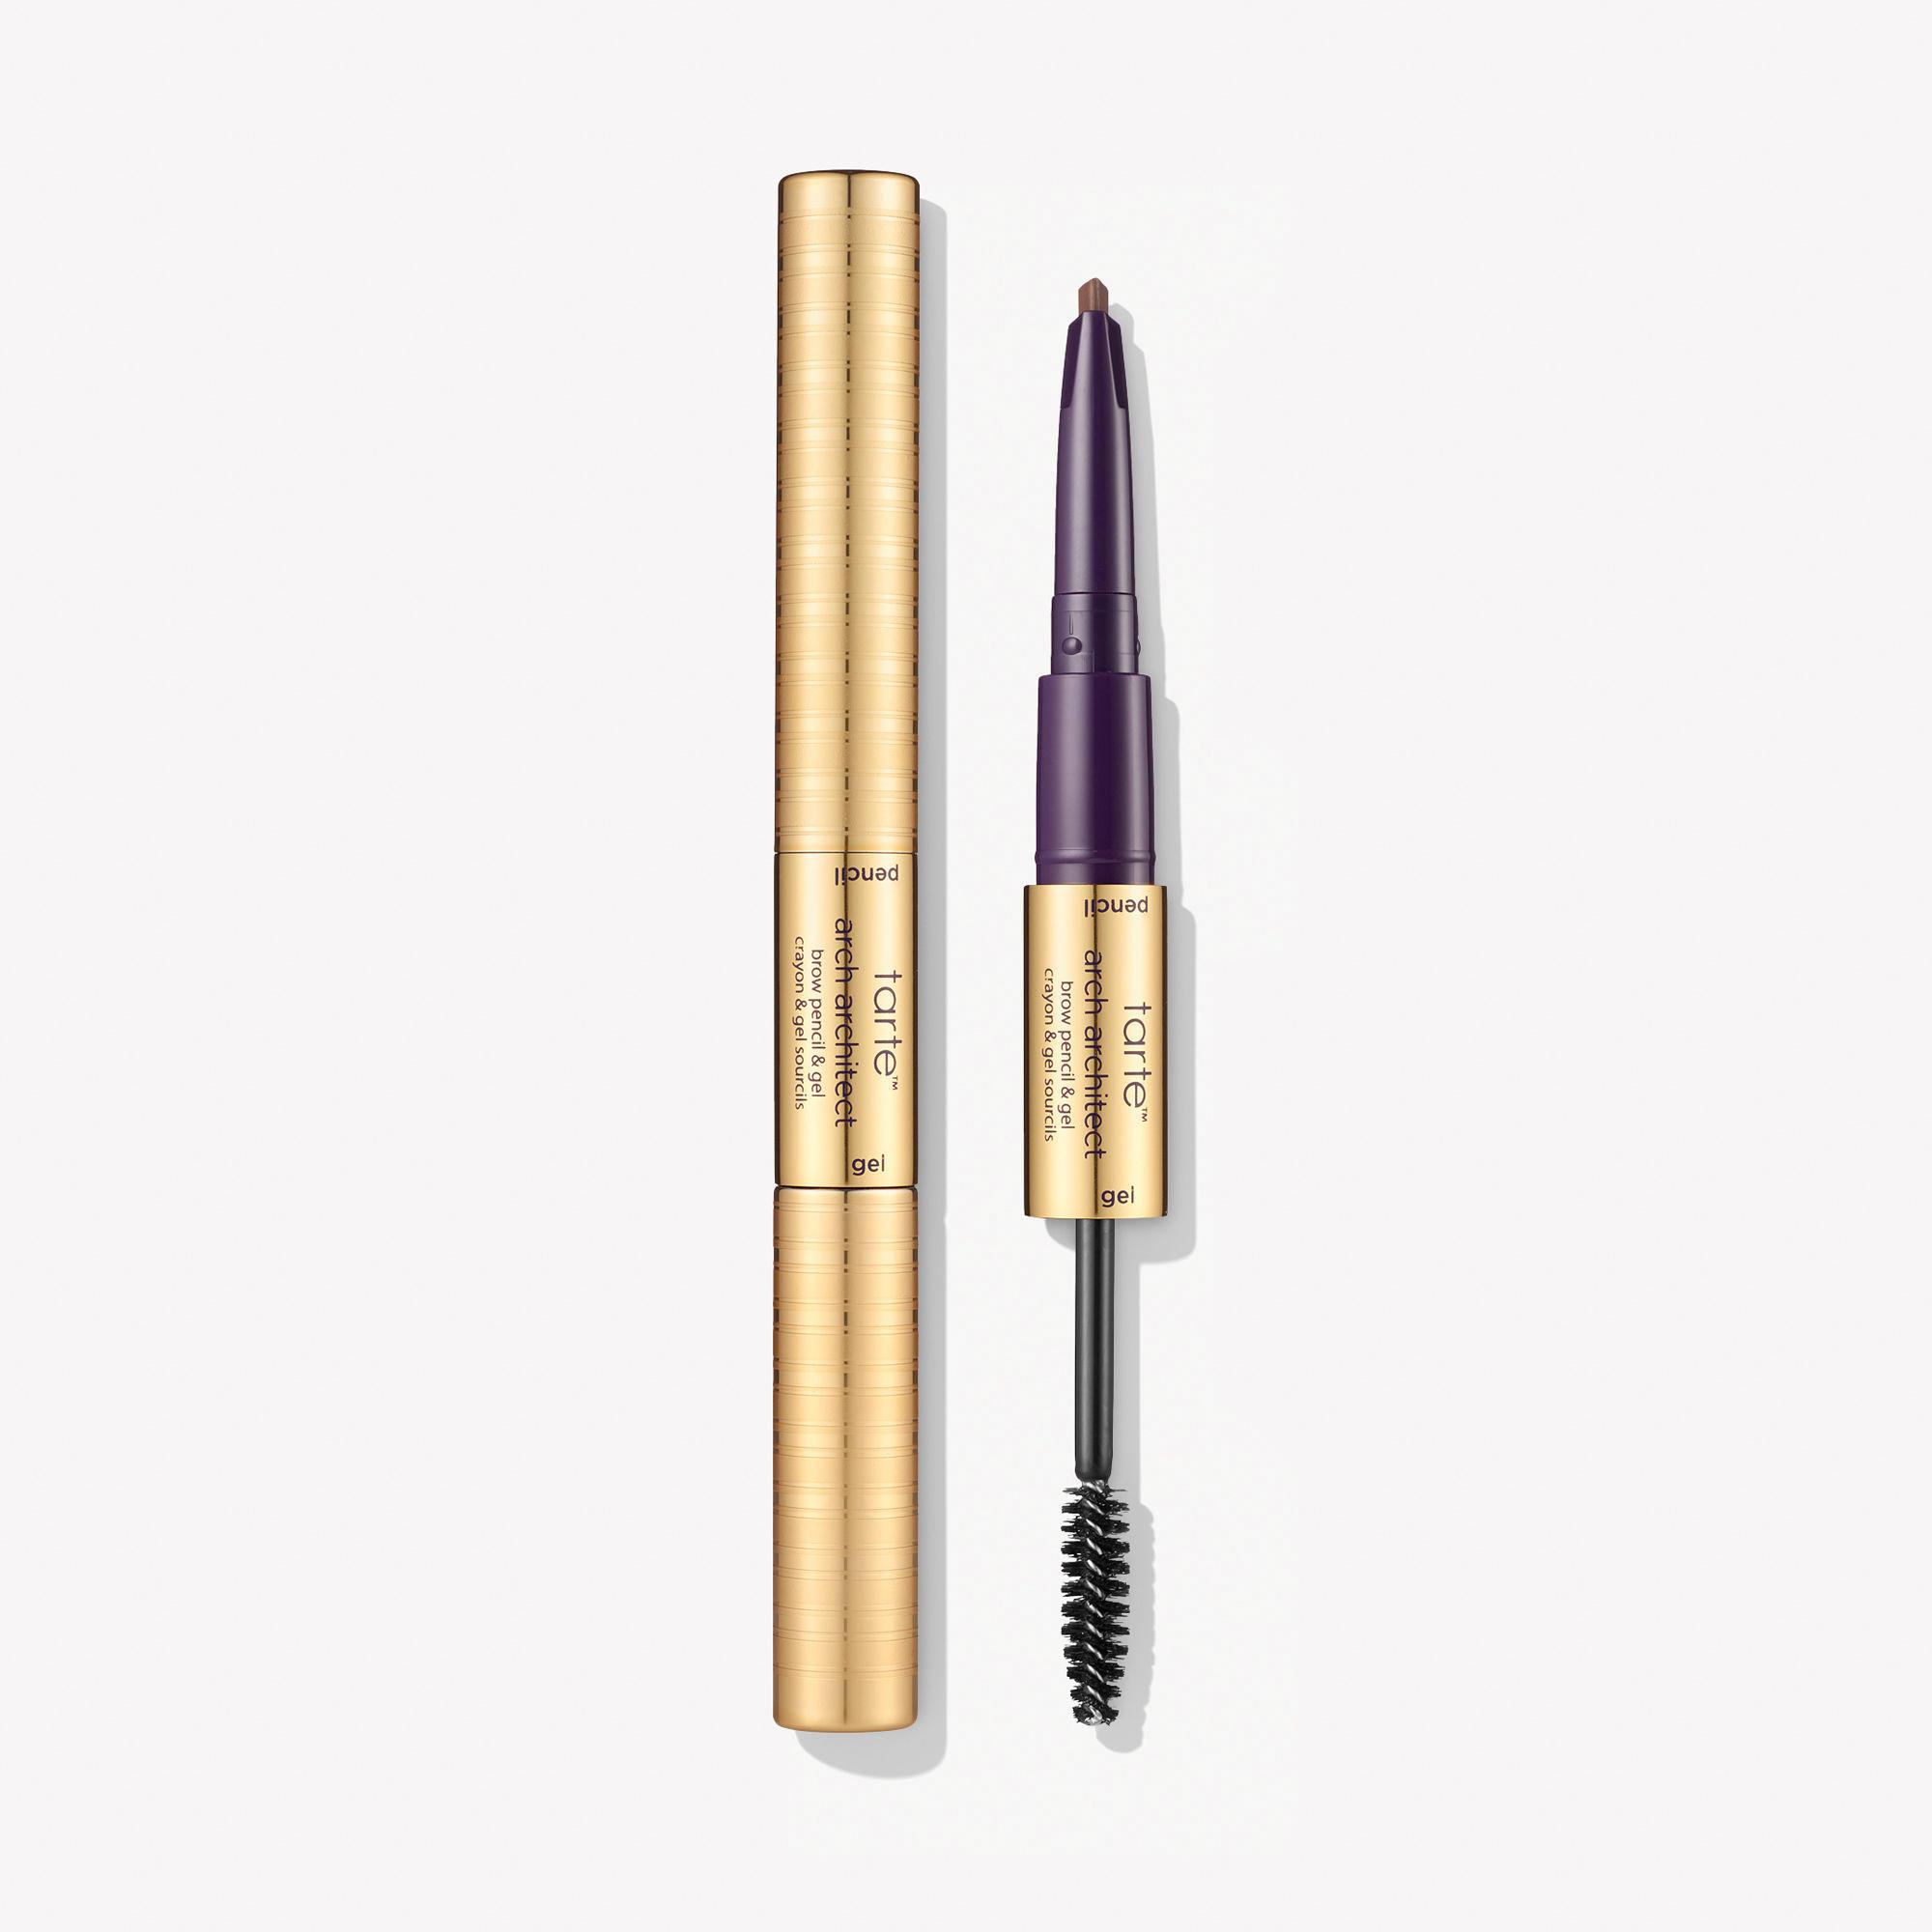 Tarte Arch Architect Brow Pencil & Gel